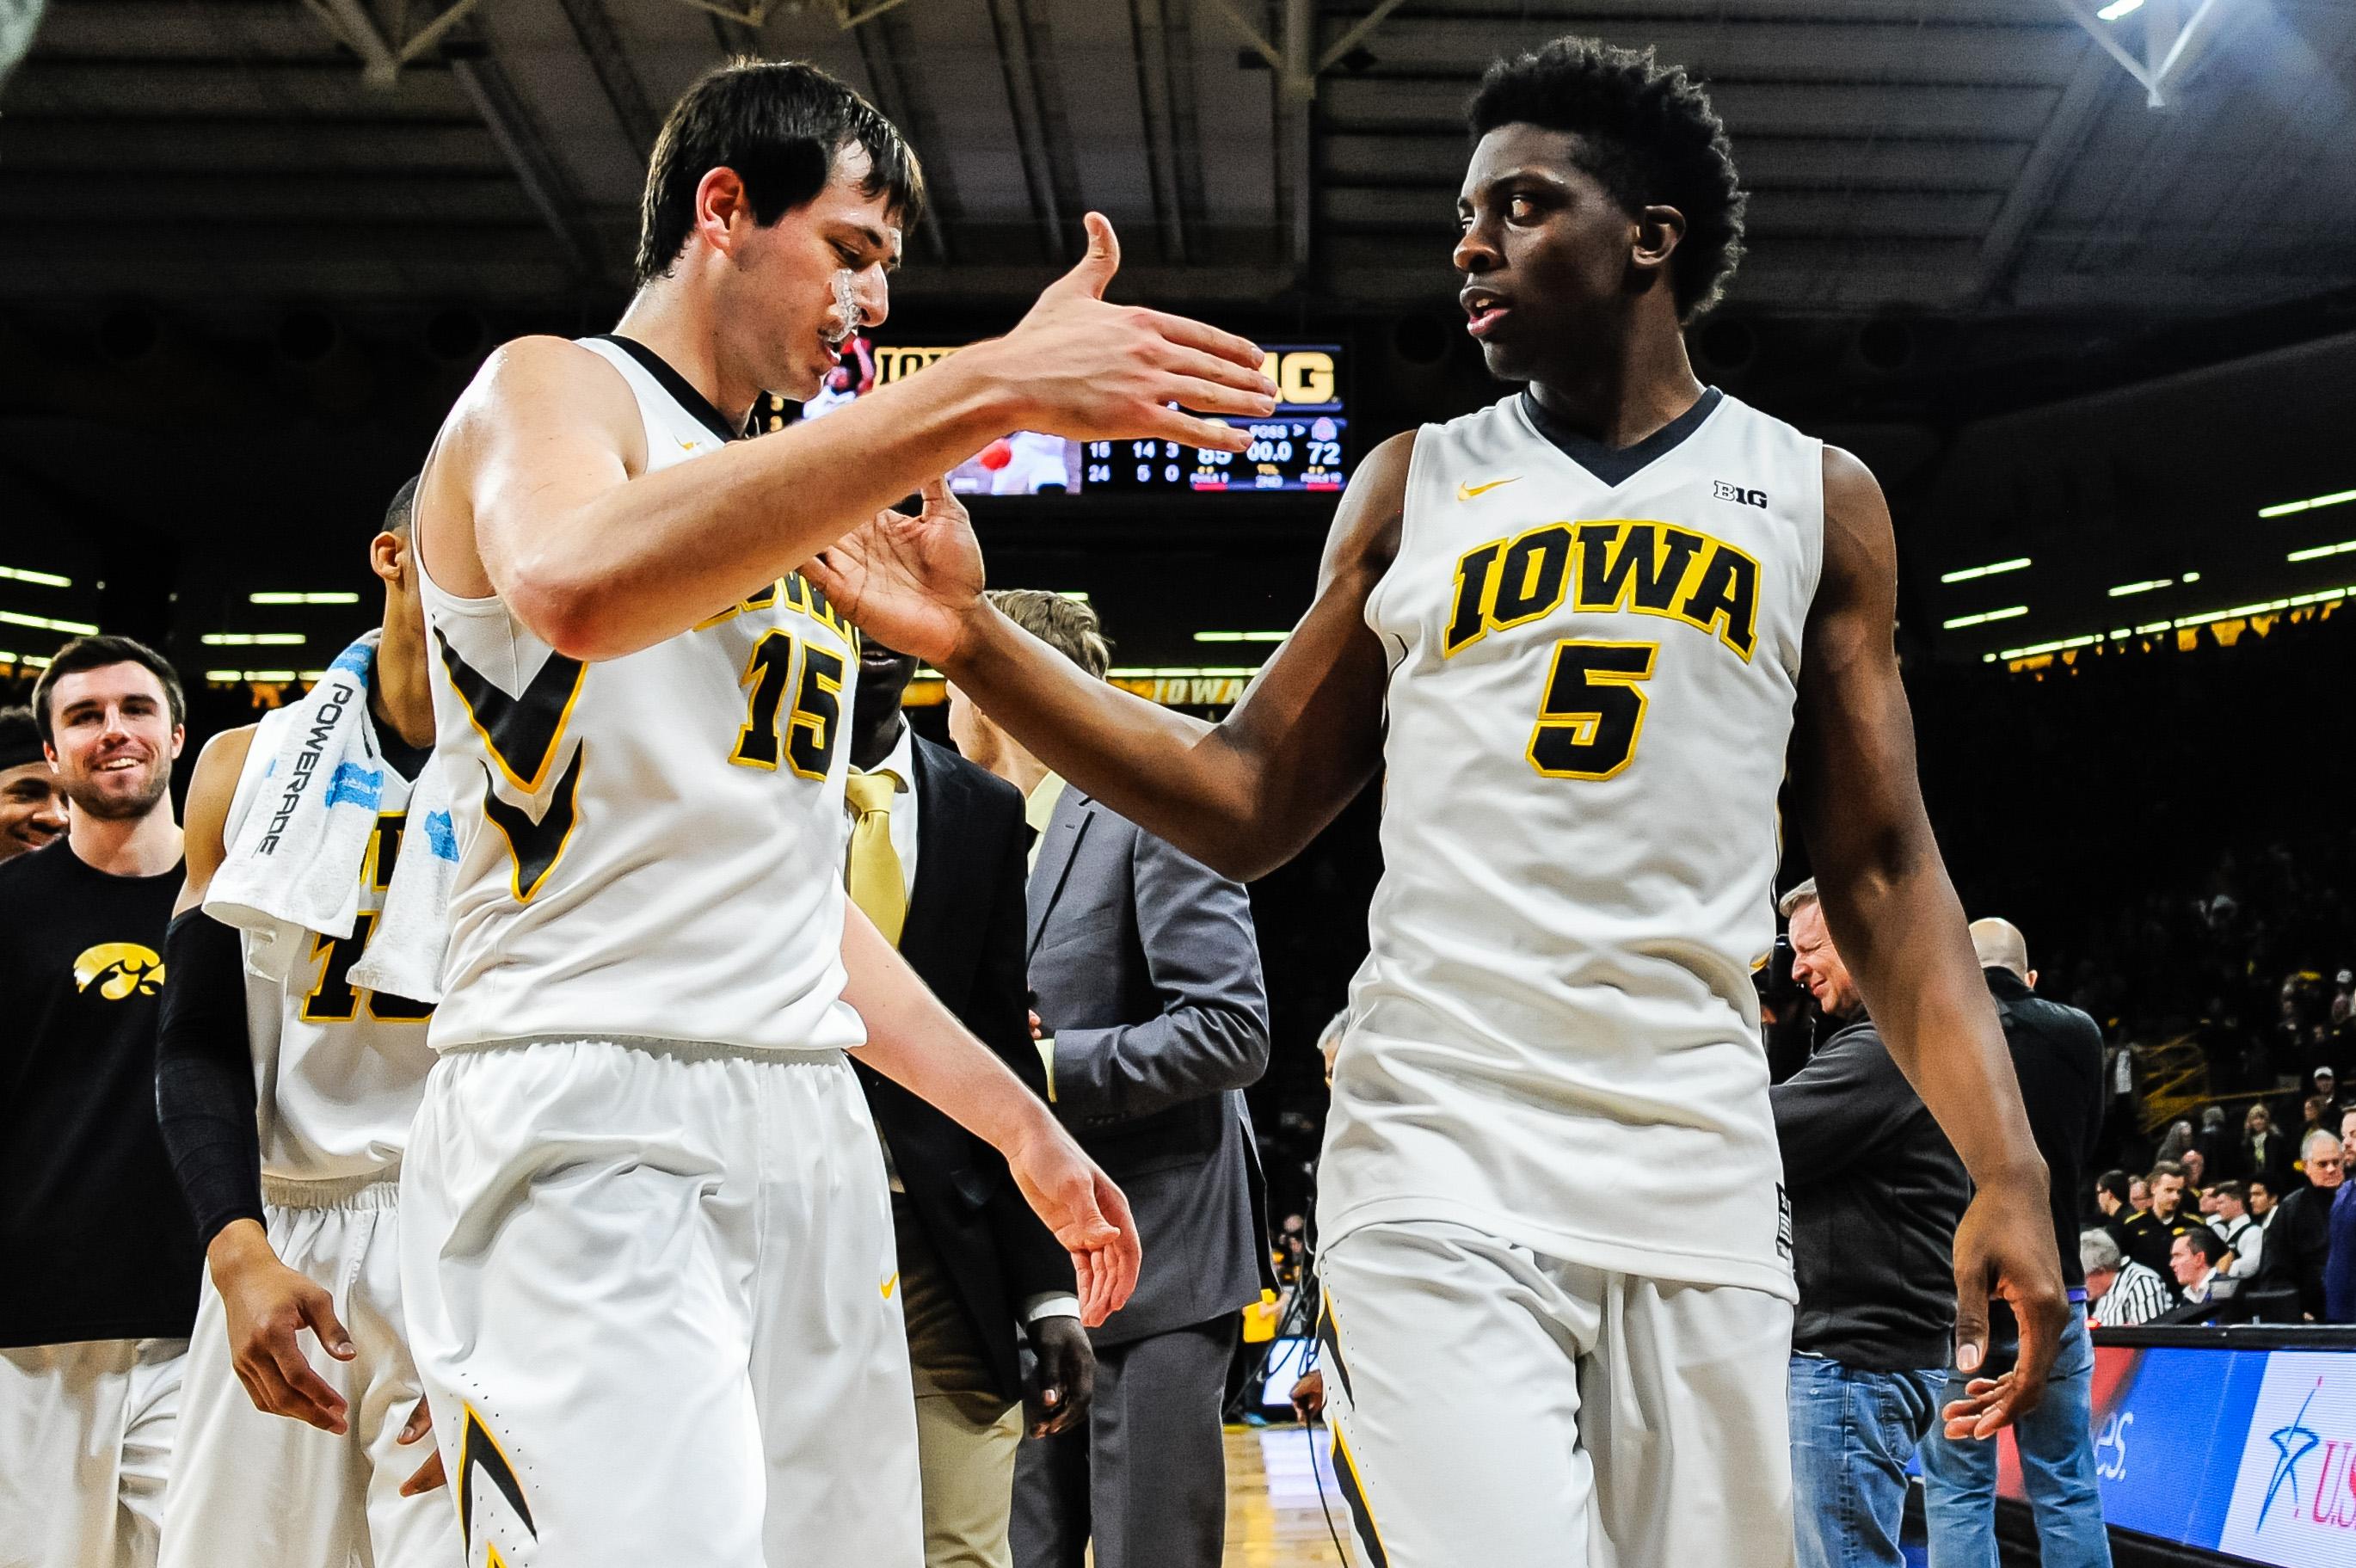 Game Awards: Iowa Basketball Crushes Ohio State At Home